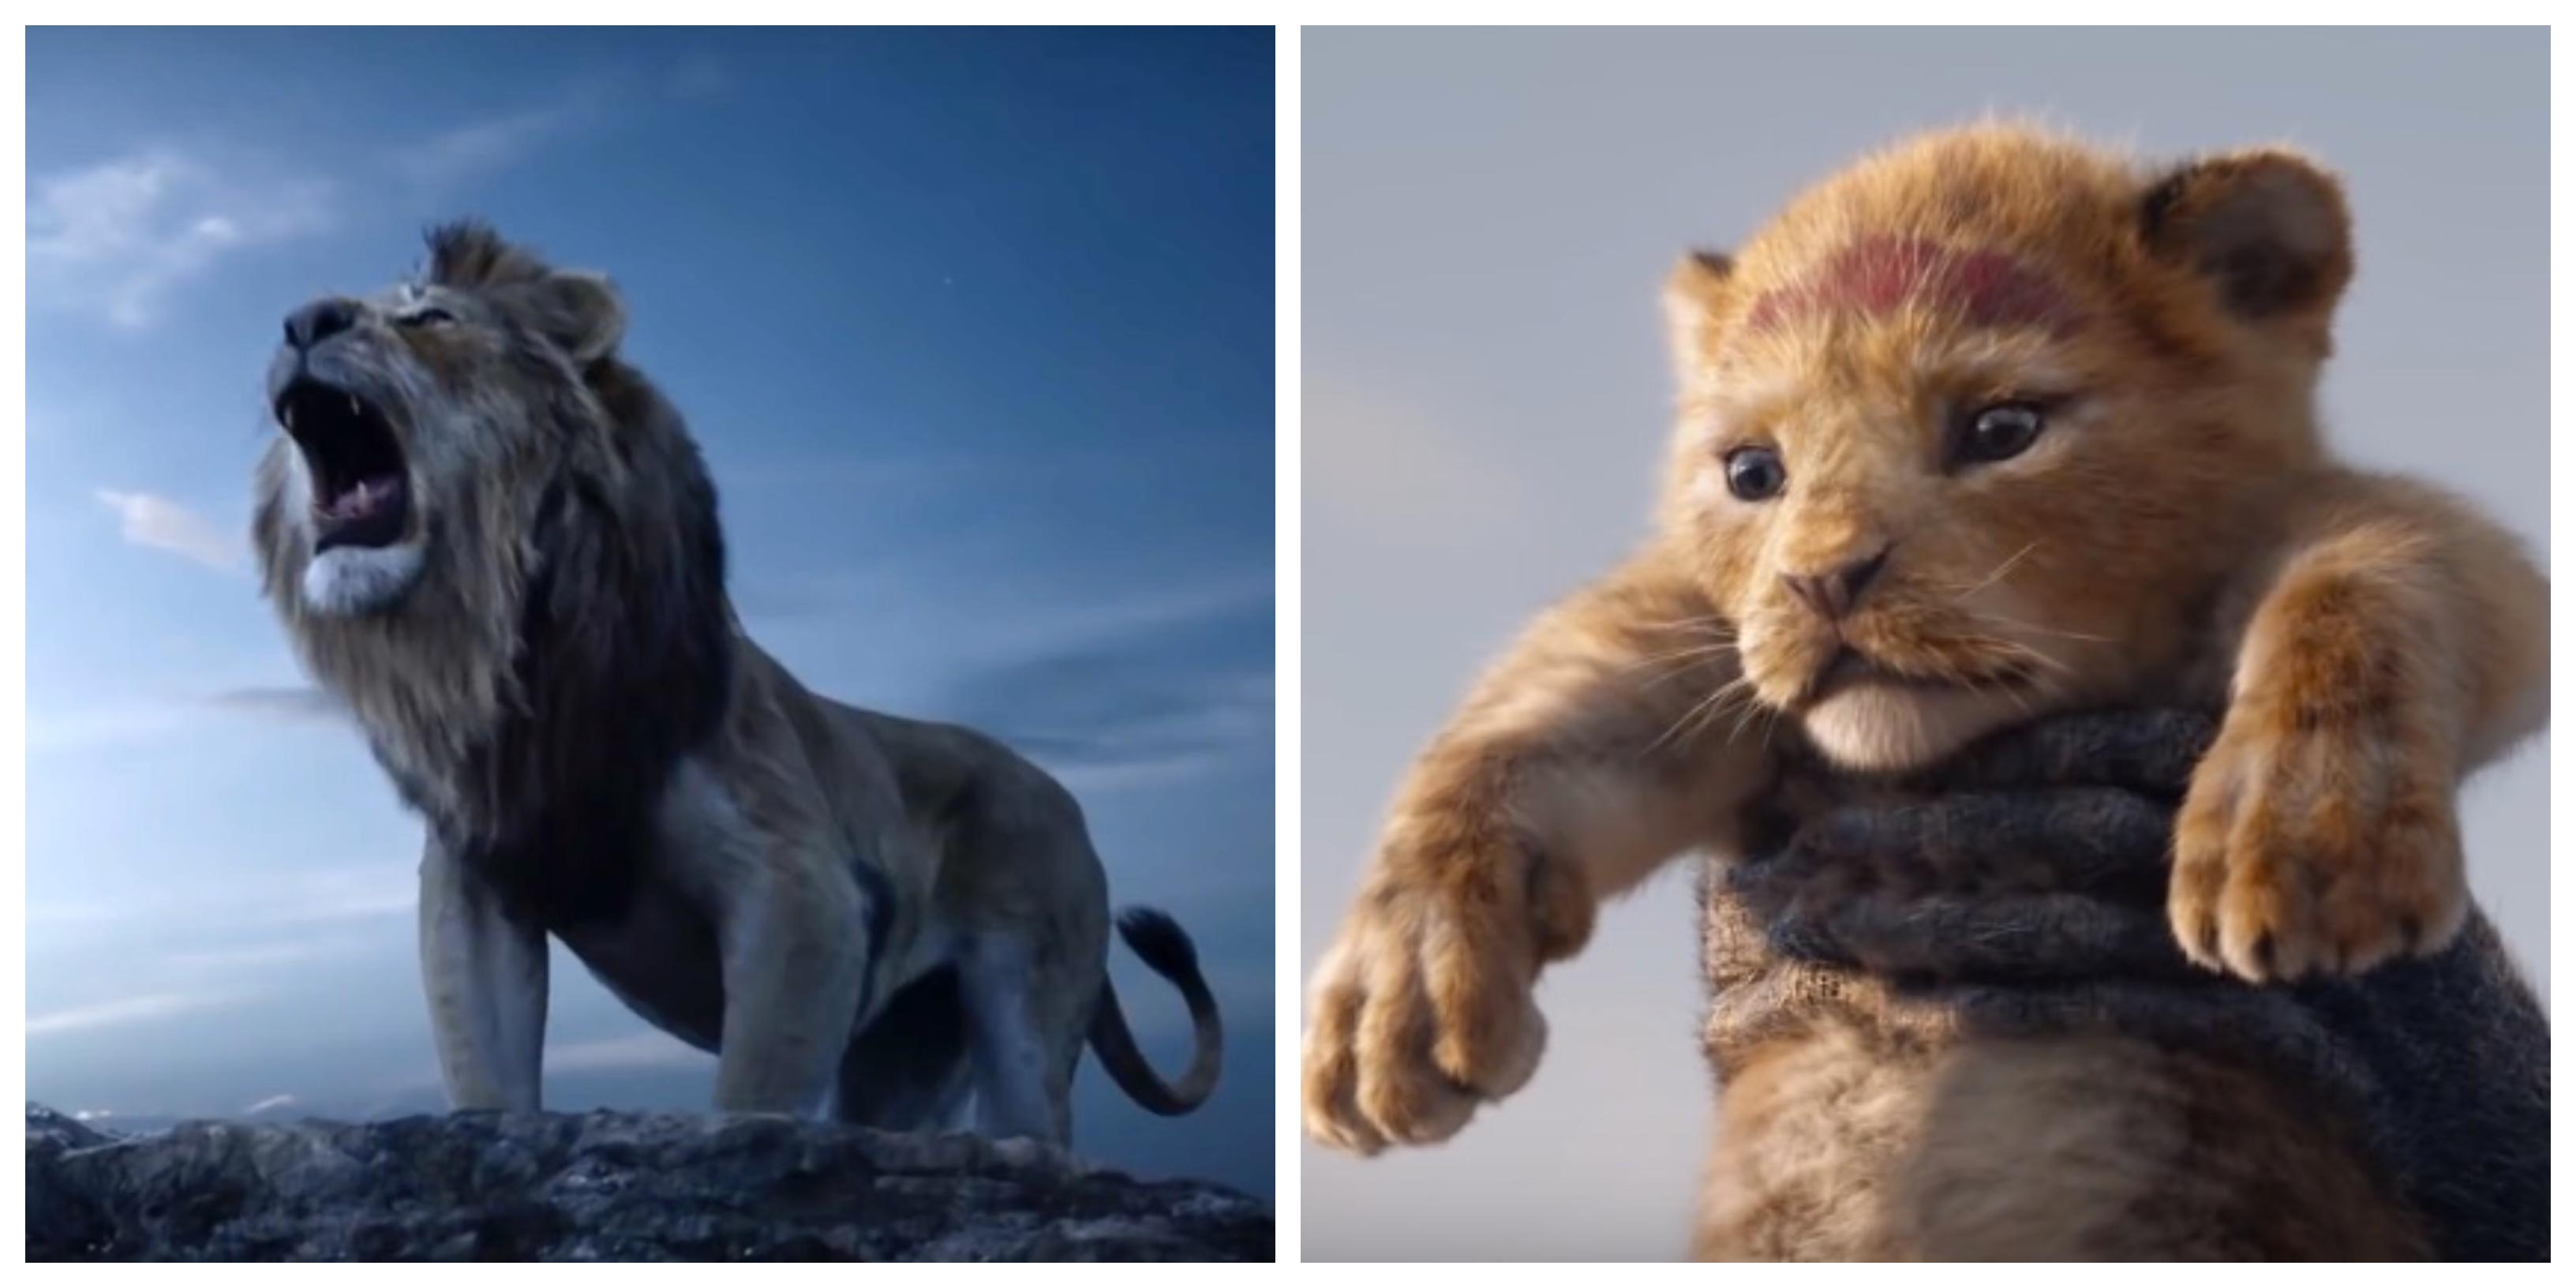 movie trailer   u0026 39 the lion king u0026 39   starring beyonce  u0026 donald